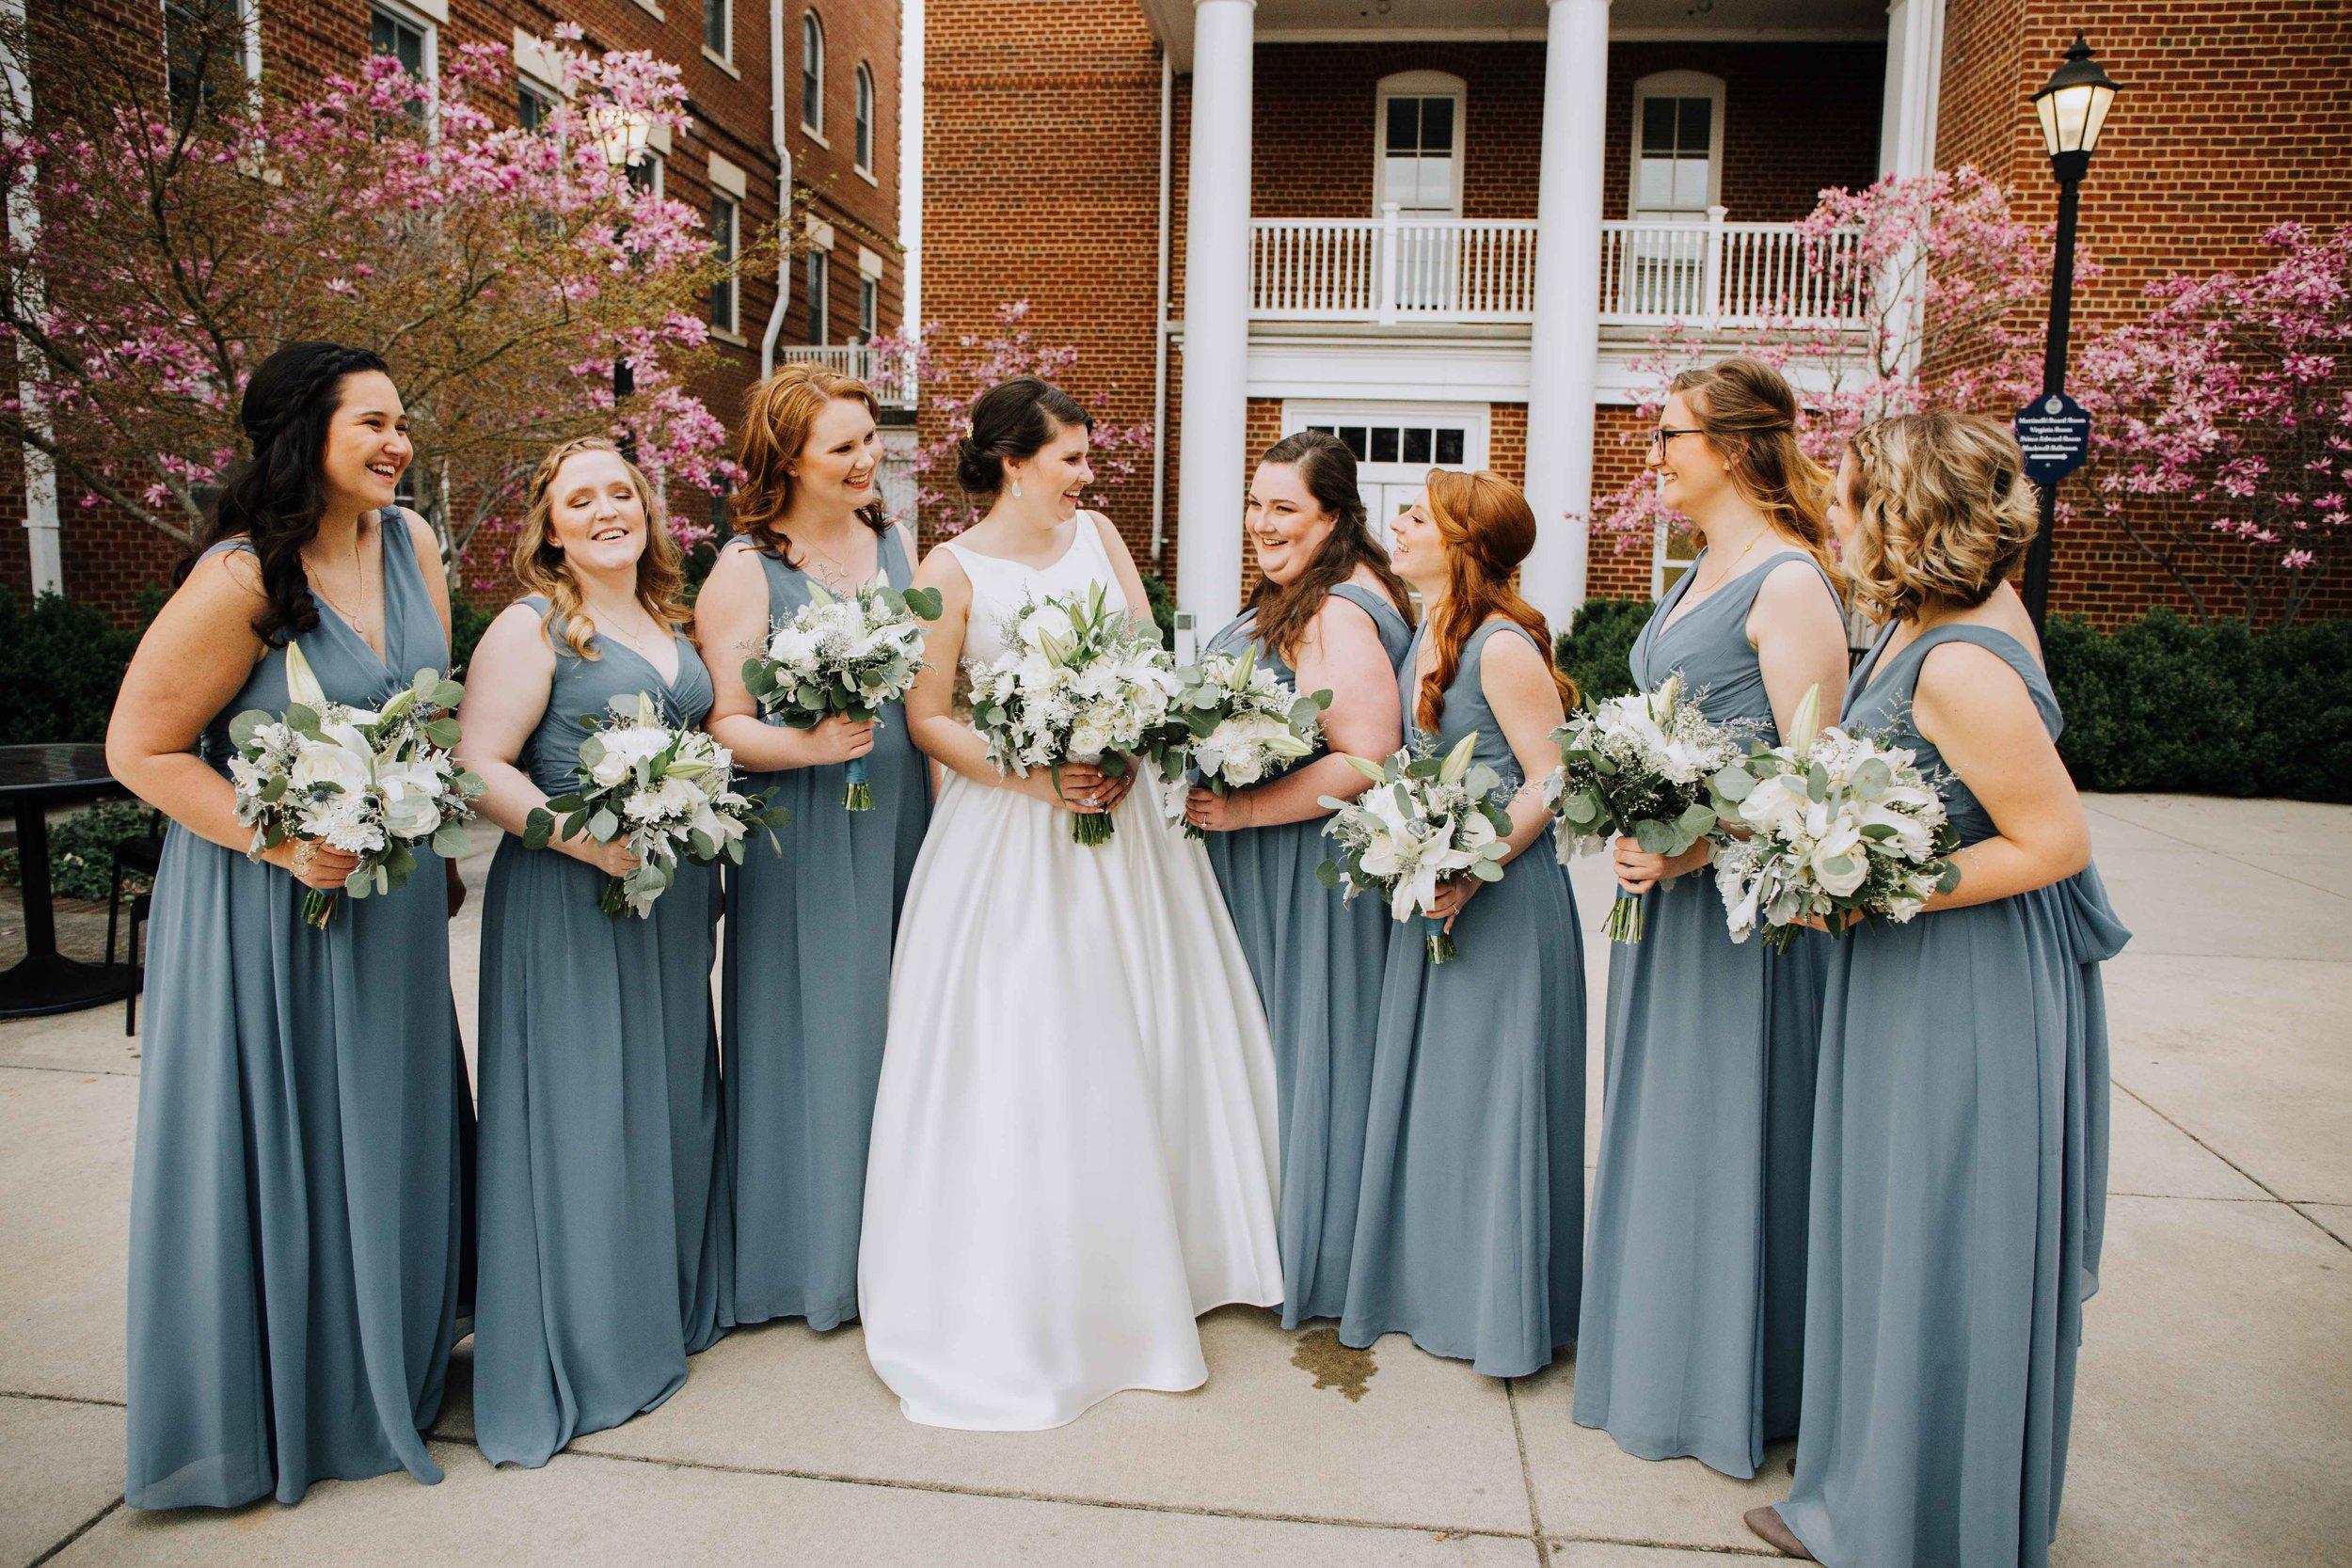 Farmville-Virginia-Wedding-Hotel-Weynoke-Downtown-Jacqueline-Waters-Photography-Detailed- (1164).jpg